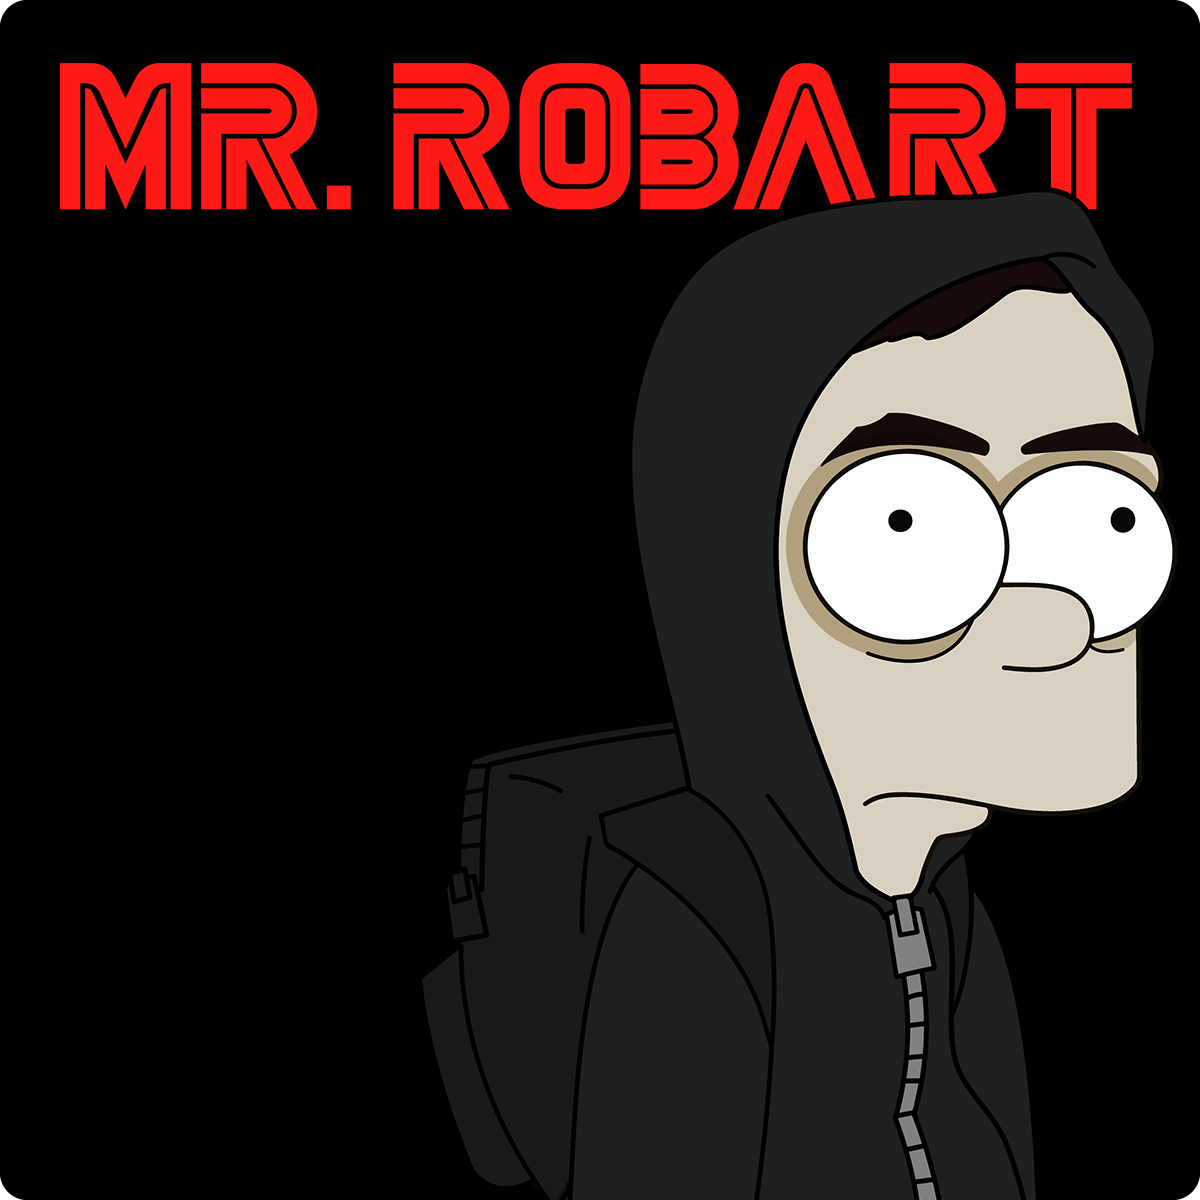 vector Character design  Logotype hacker simpsons Mr. Robot mash-up Rami Malek portrait